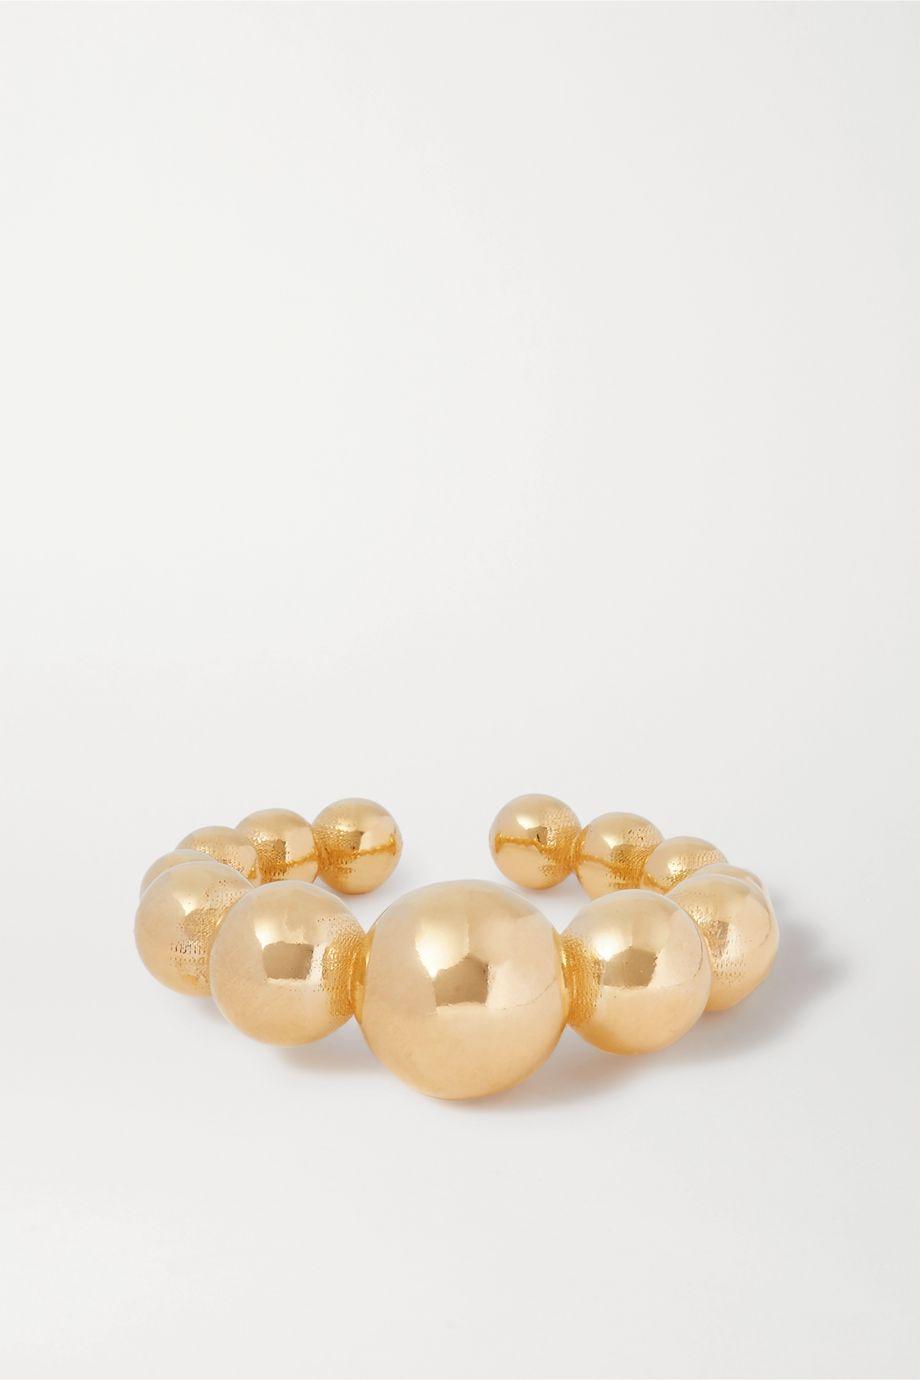 Saskia Diez + NET SUSTAIN Drop gold ear cuff